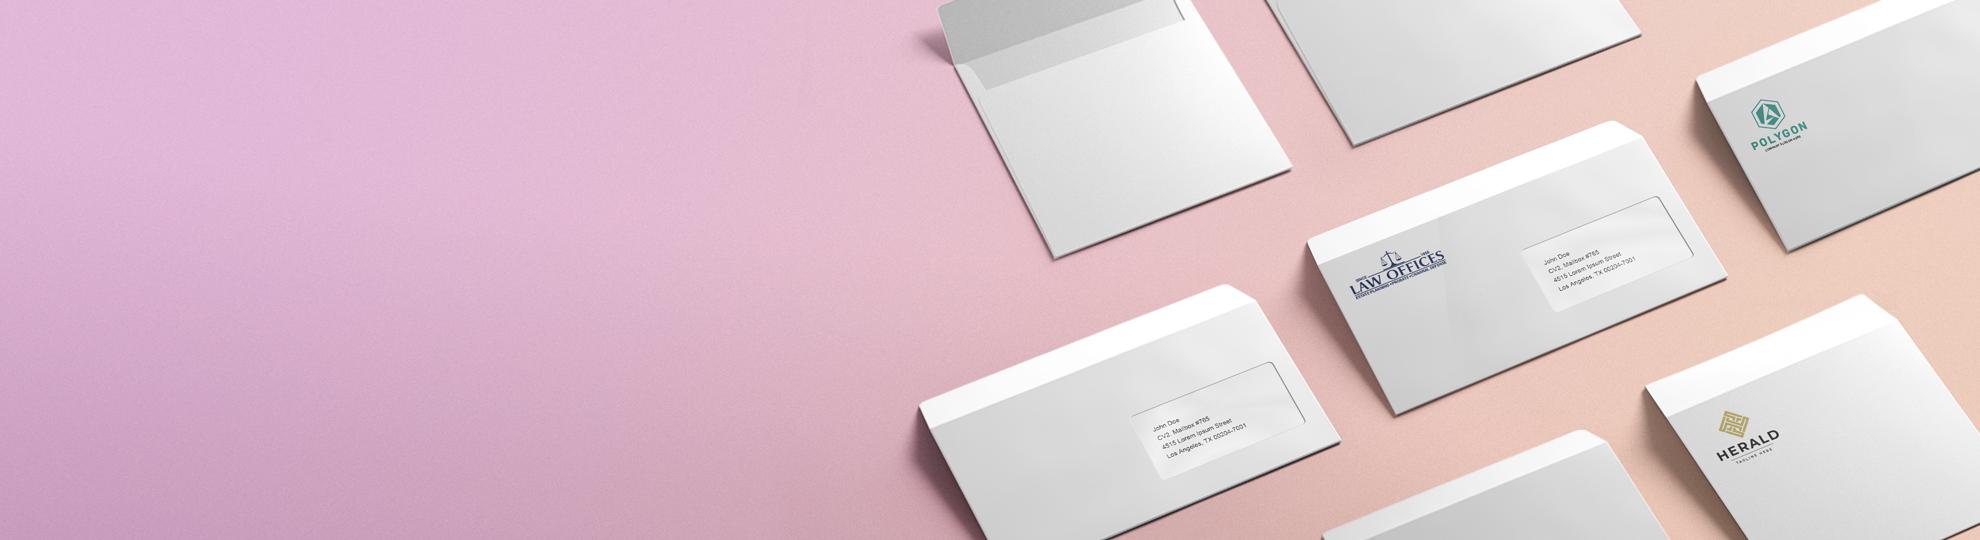 Imprimer enveloppes personnalisées en ligne envoi express